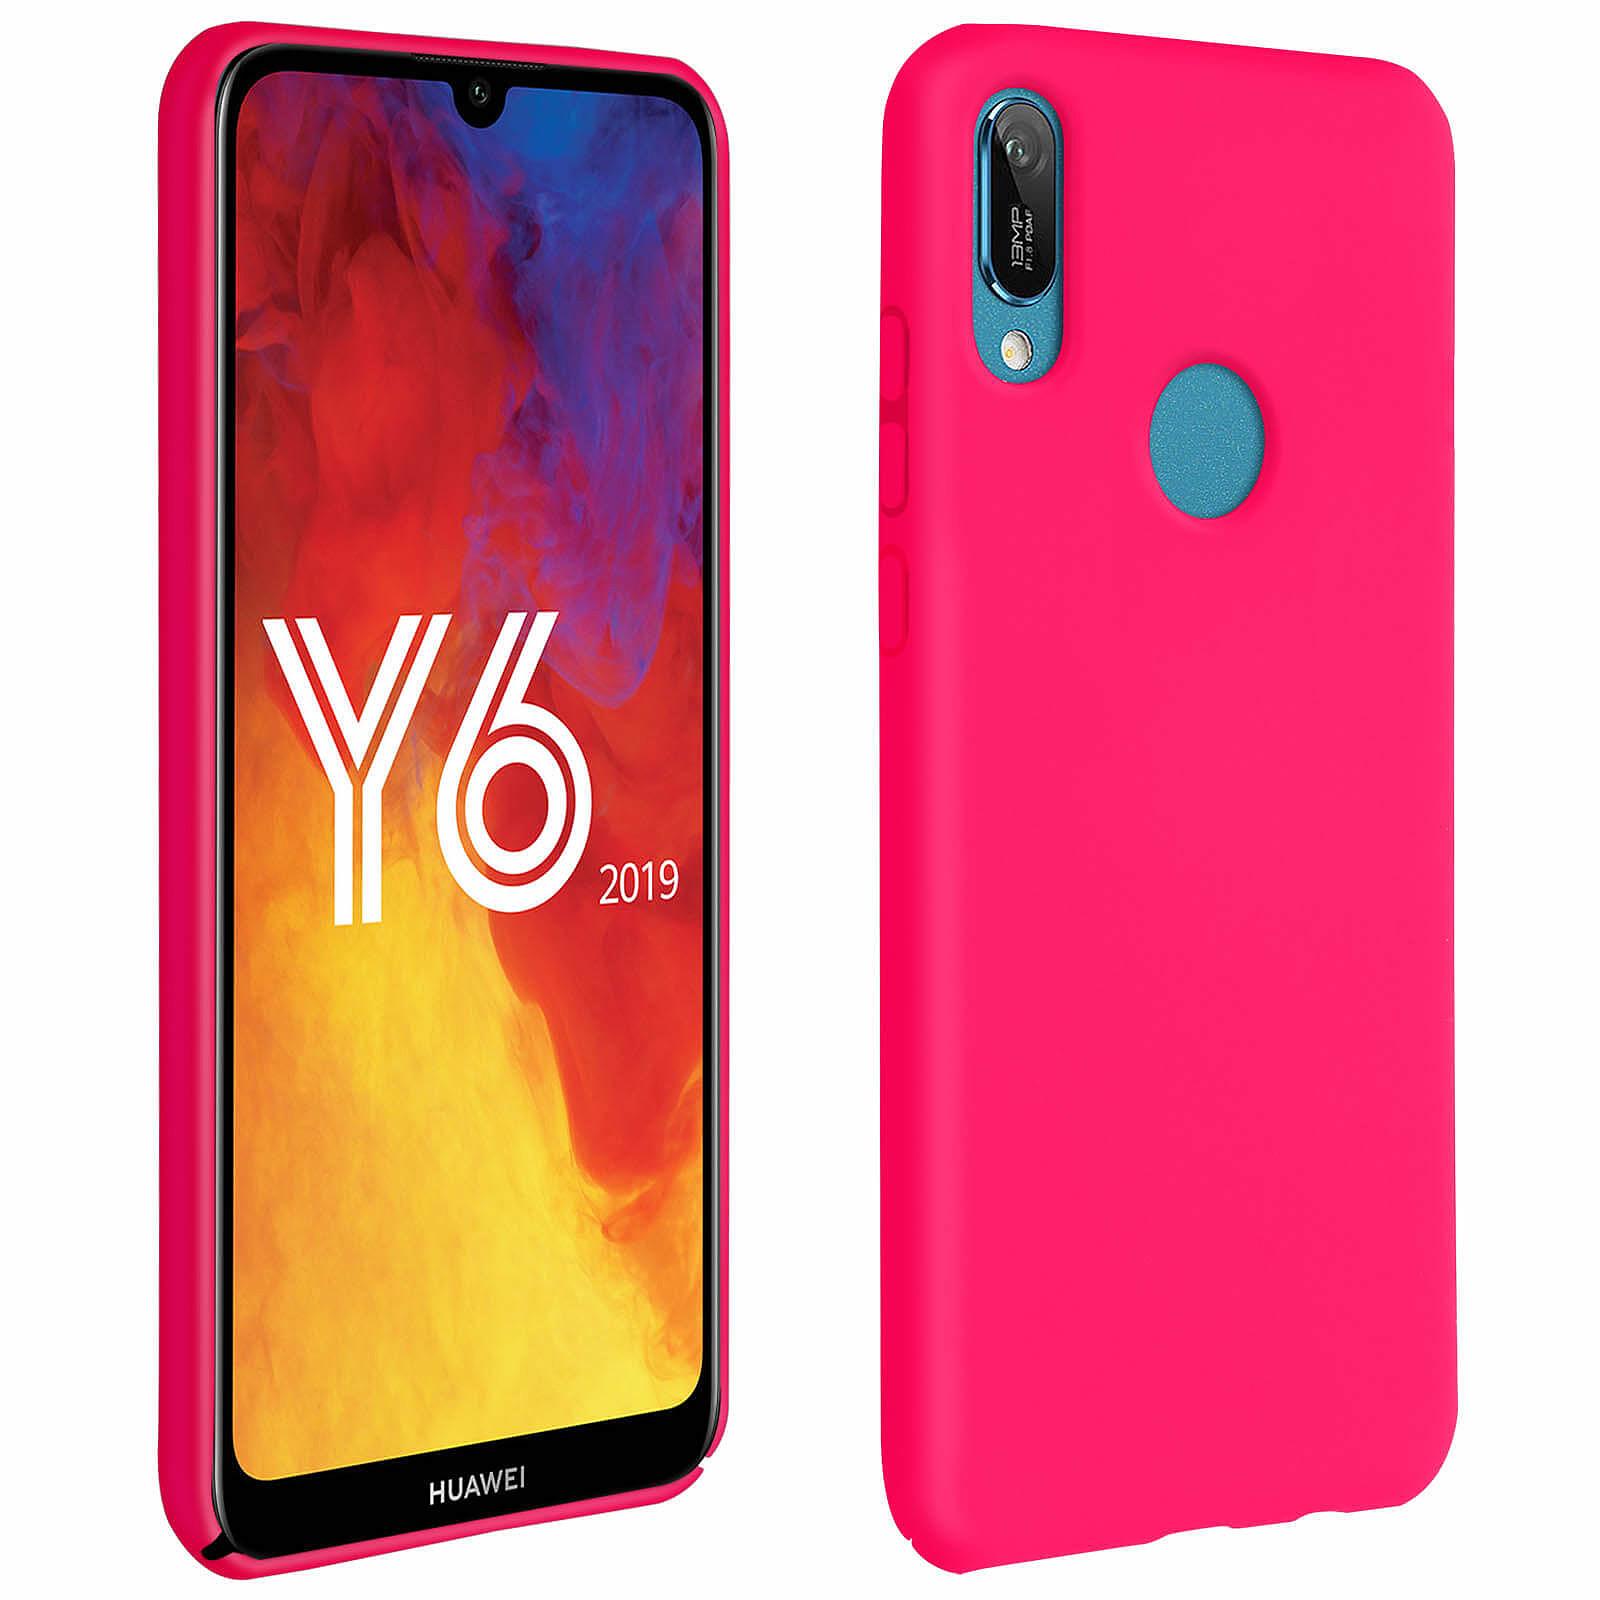 Avizar Coque Fuchsia pour Honor 8A , Huawei Y6 2019 , Huawei Y6S